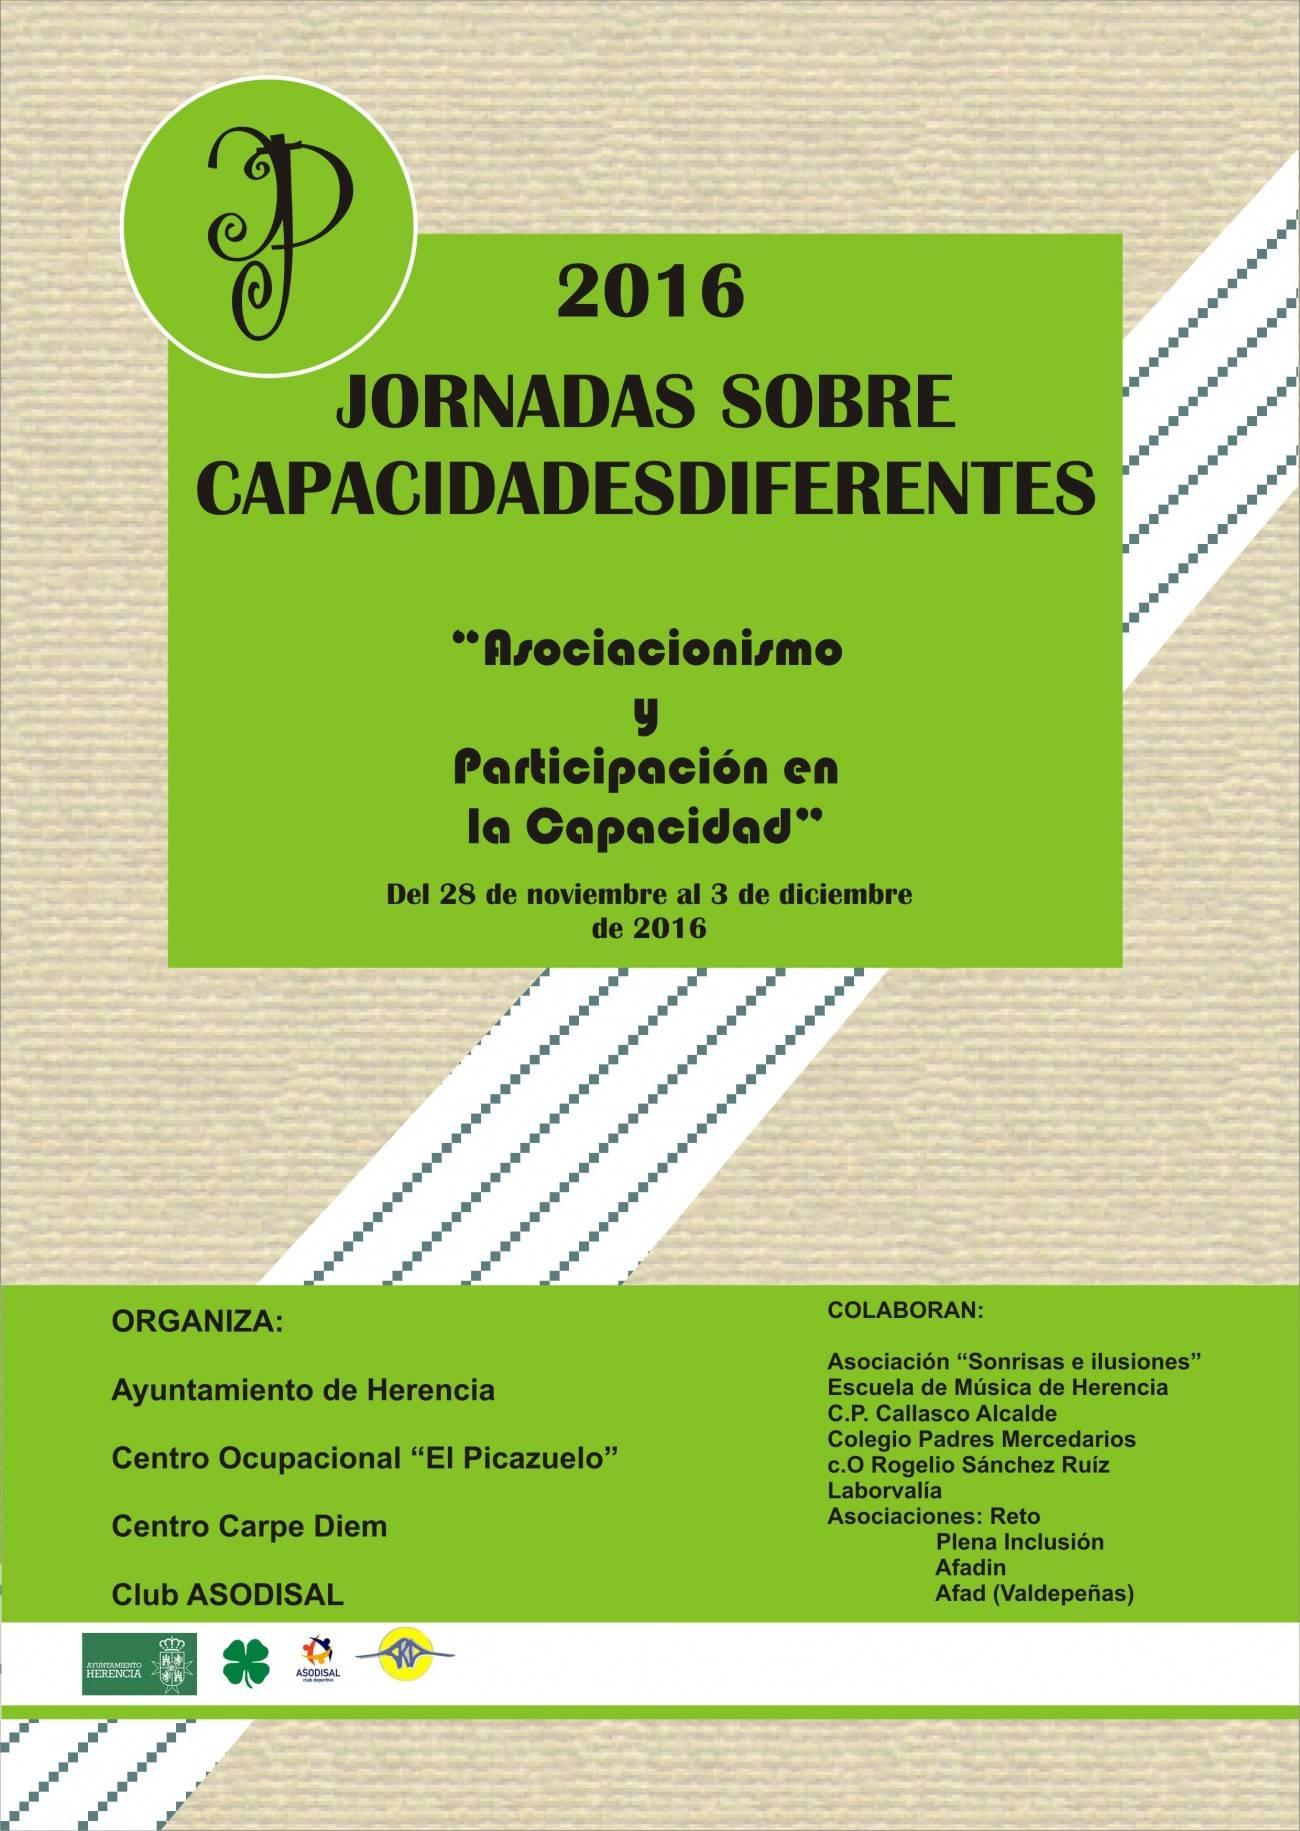 jornadas sobre capacidades diferentes en herencia - Jornadas sobre capacidades diferentes 2016 en Herencia